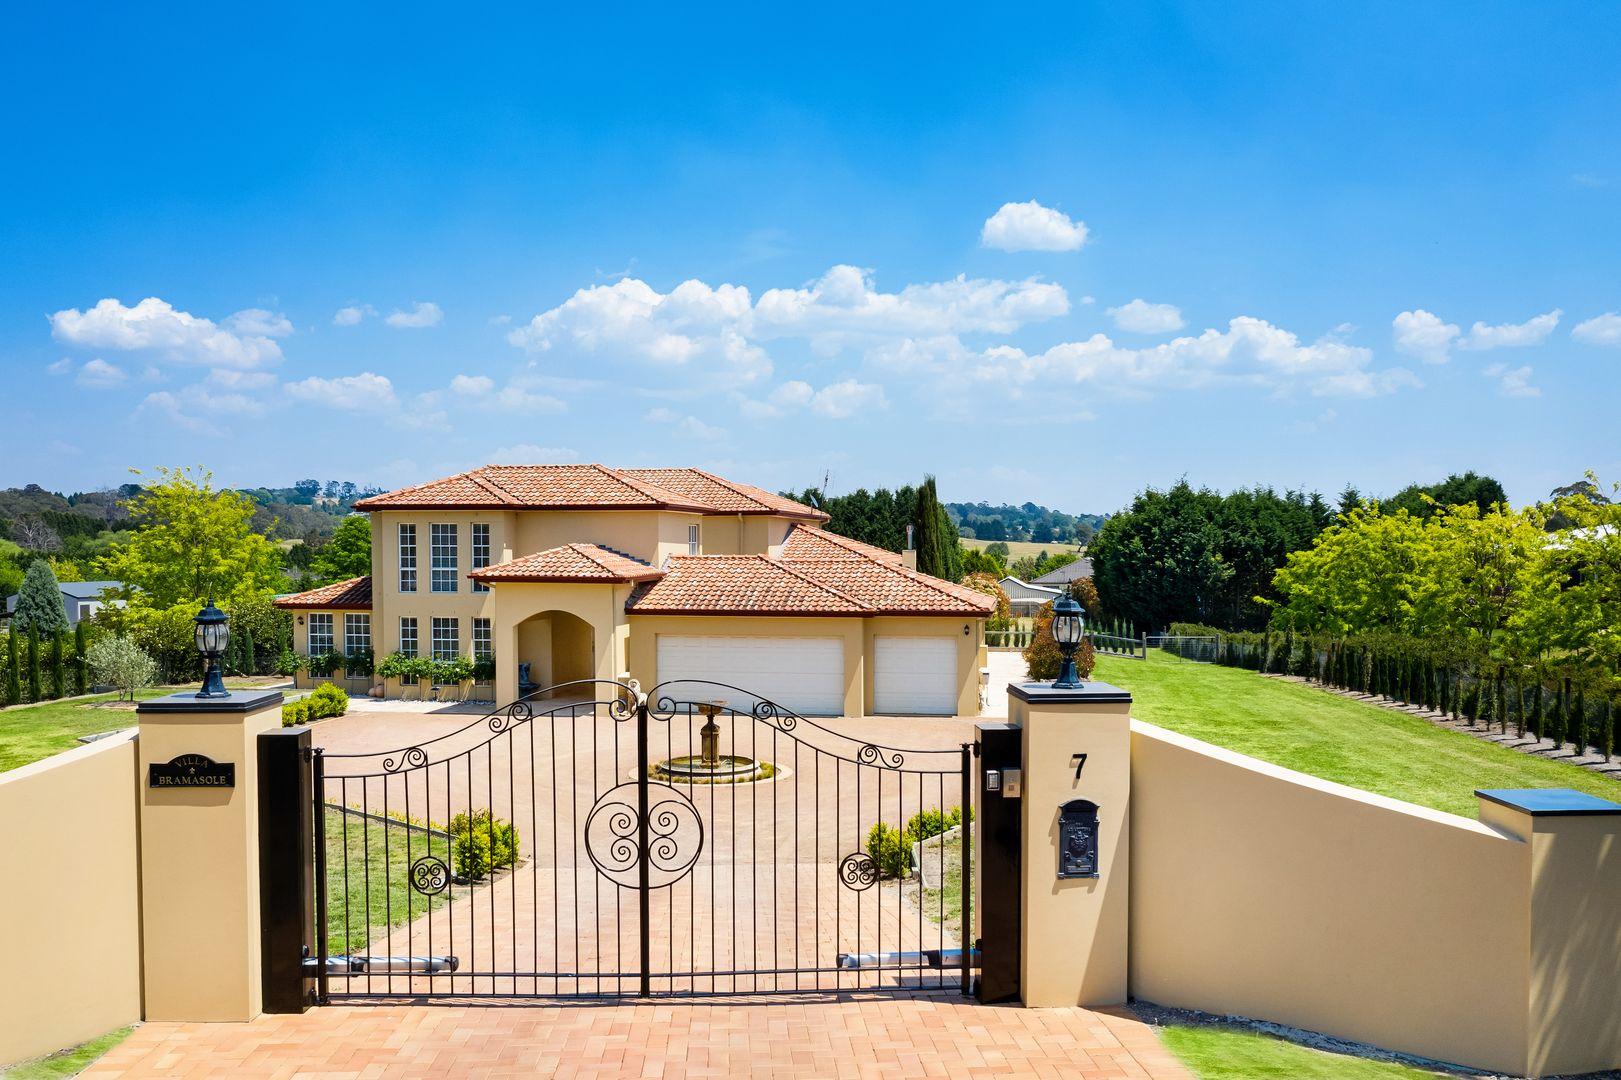 'Villa Bramasole' 7 Windsor  Crescent, Moss Vale NSW 2577, Image 0